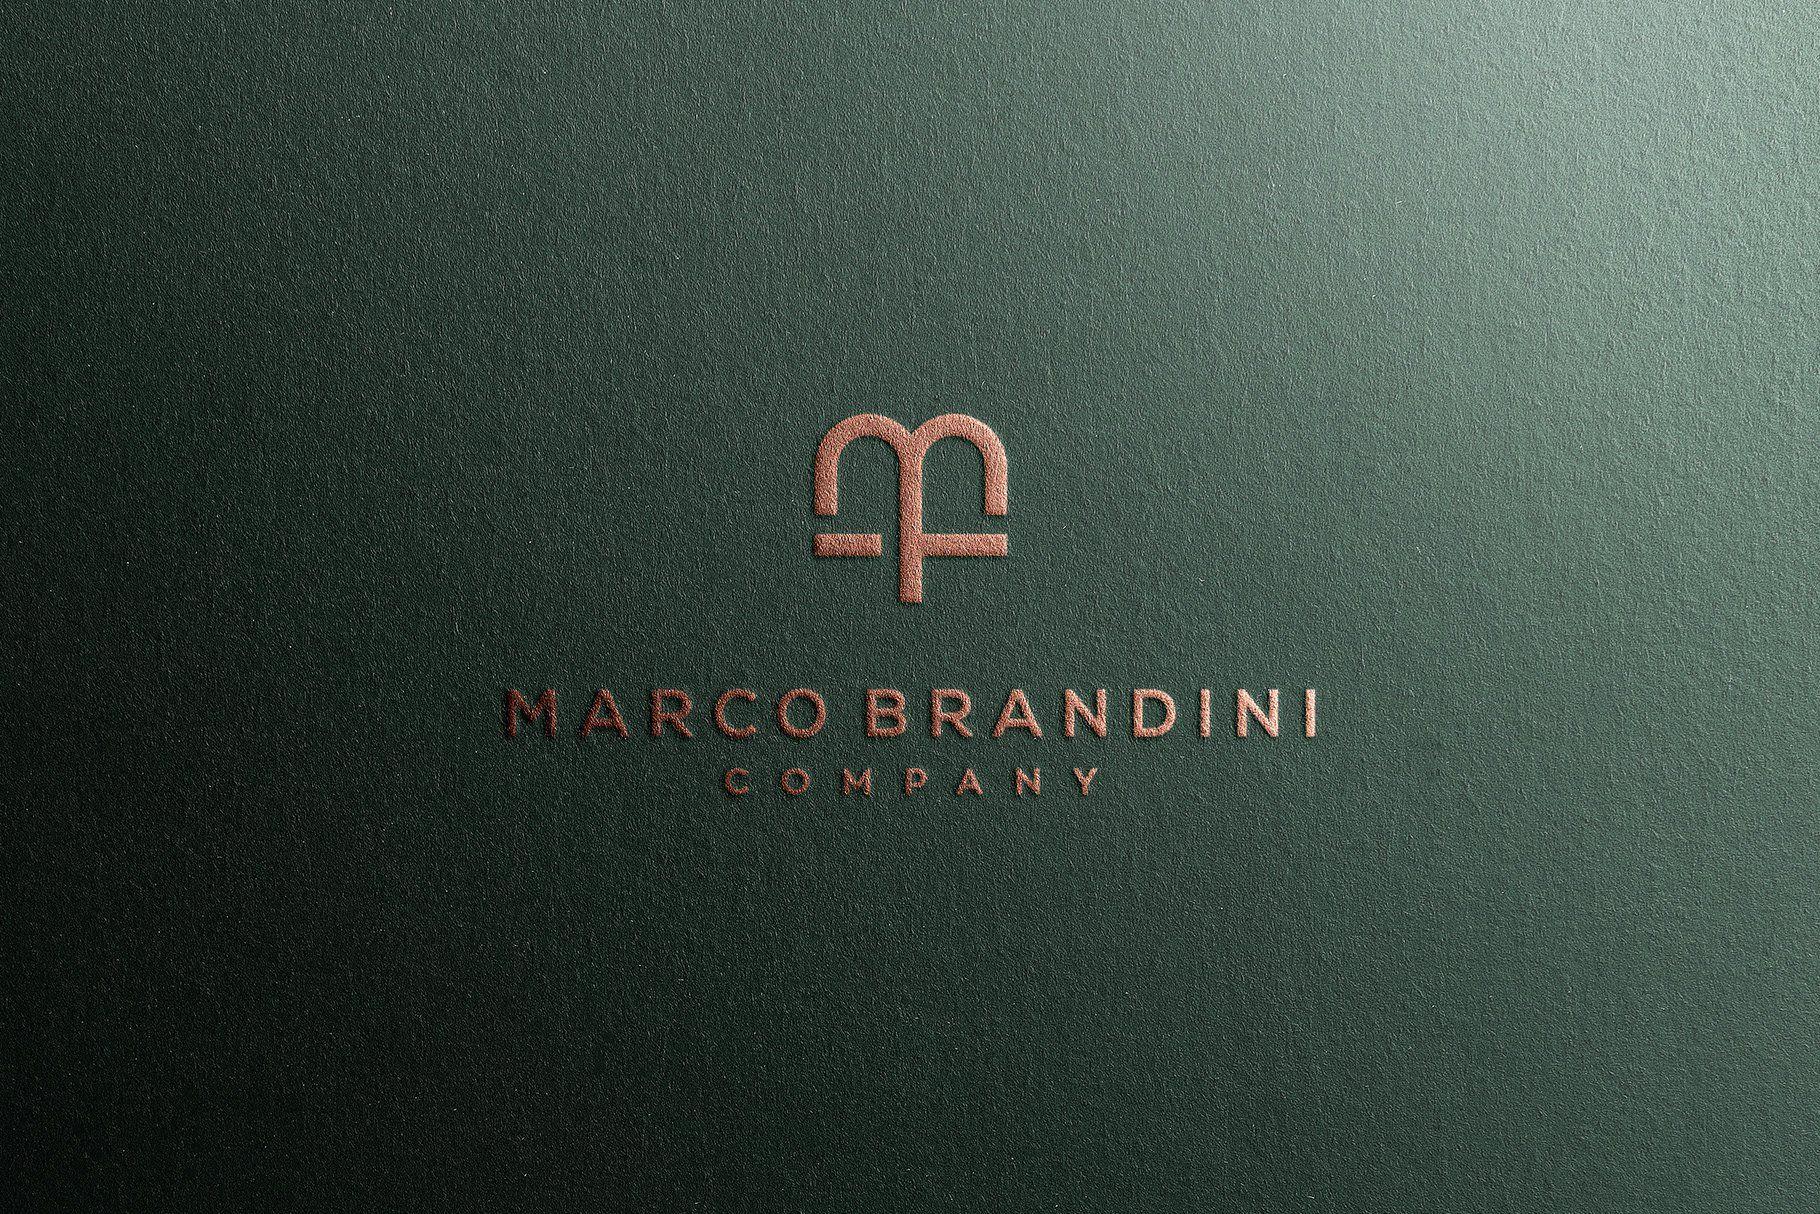 Download Logo Mockup Luxury Paper Logo Mockup Business Card Mock Up Luxury Paper